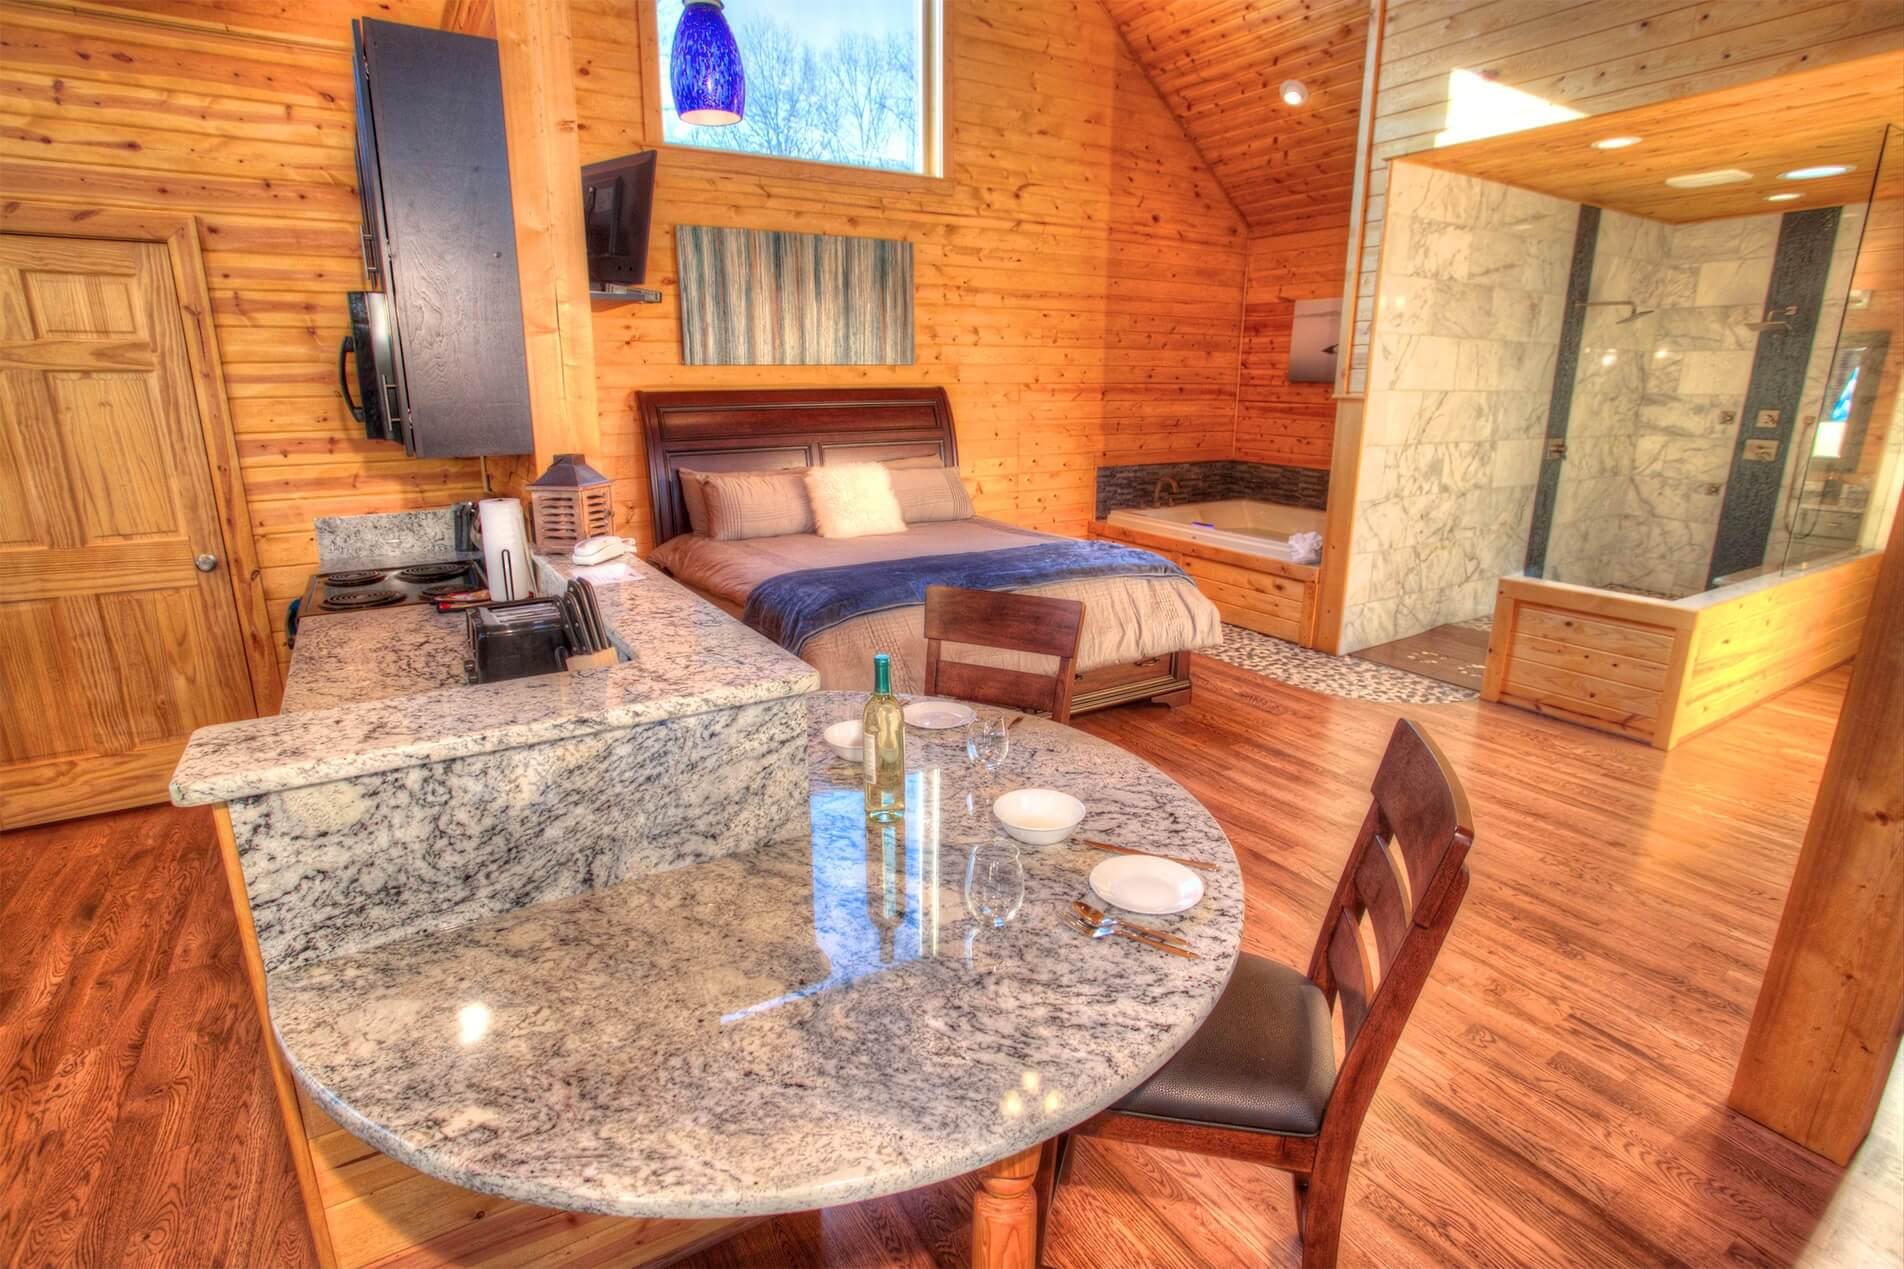 Radiance-Cedar-Creek-Cabin-Rentals-Helen-Georgia-top-banner-tiny